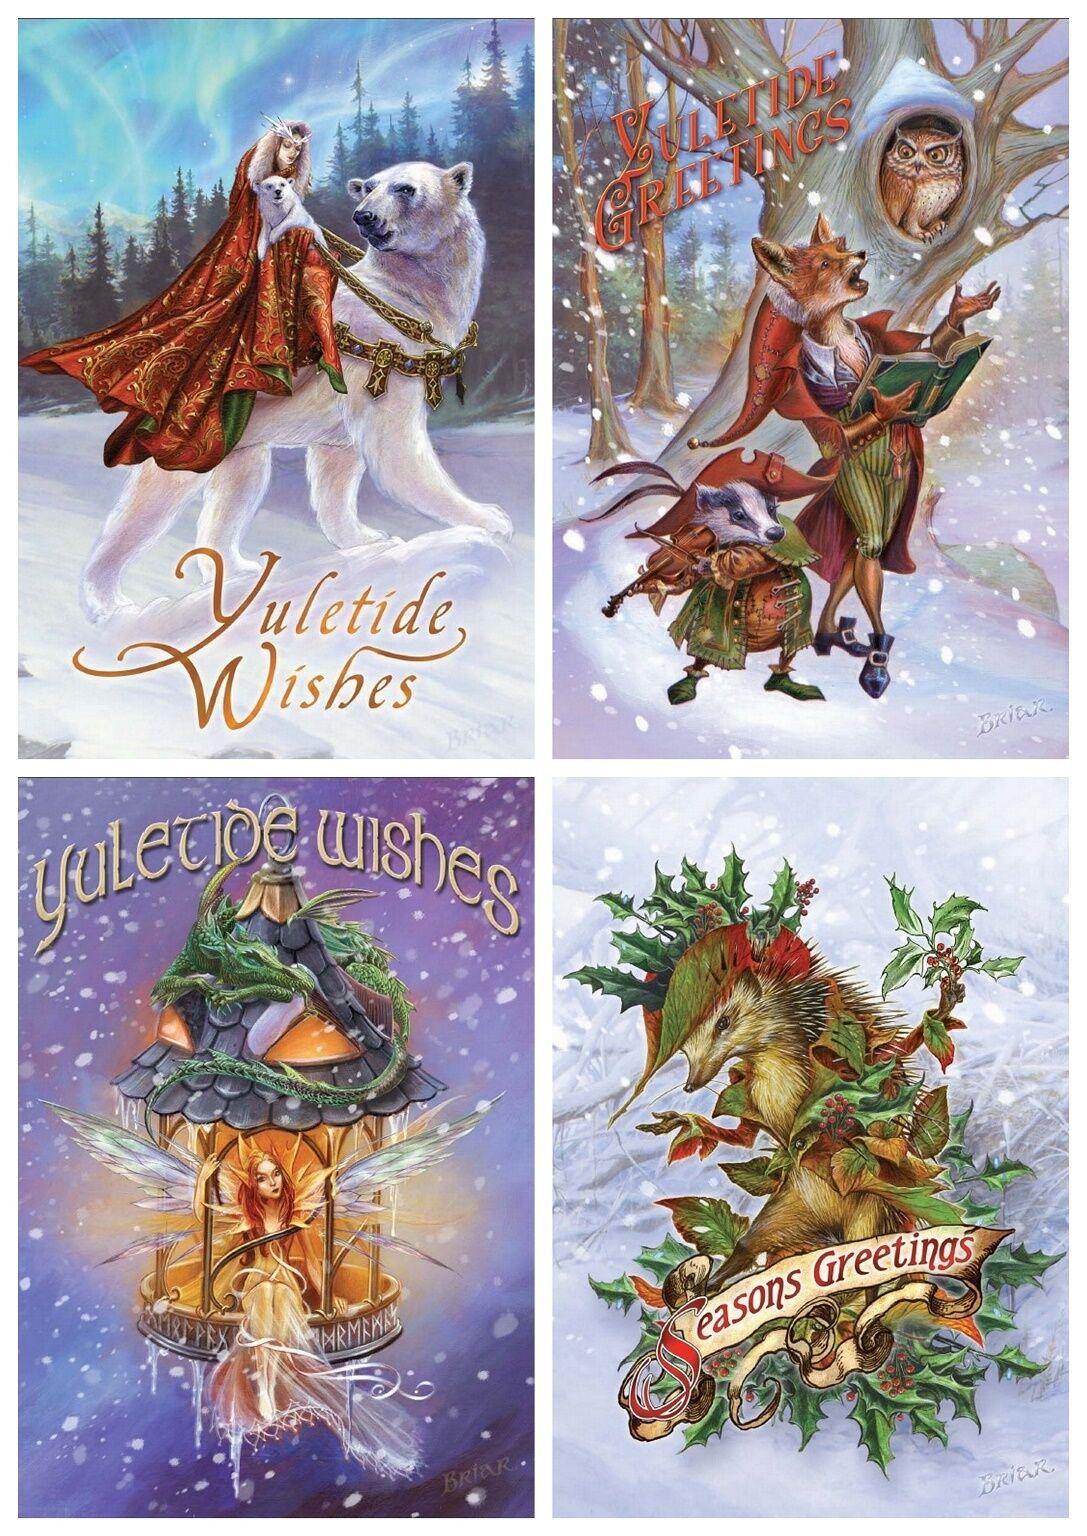 Briar Yule Midwinter Solstice Greeting Card Alternative Christmas